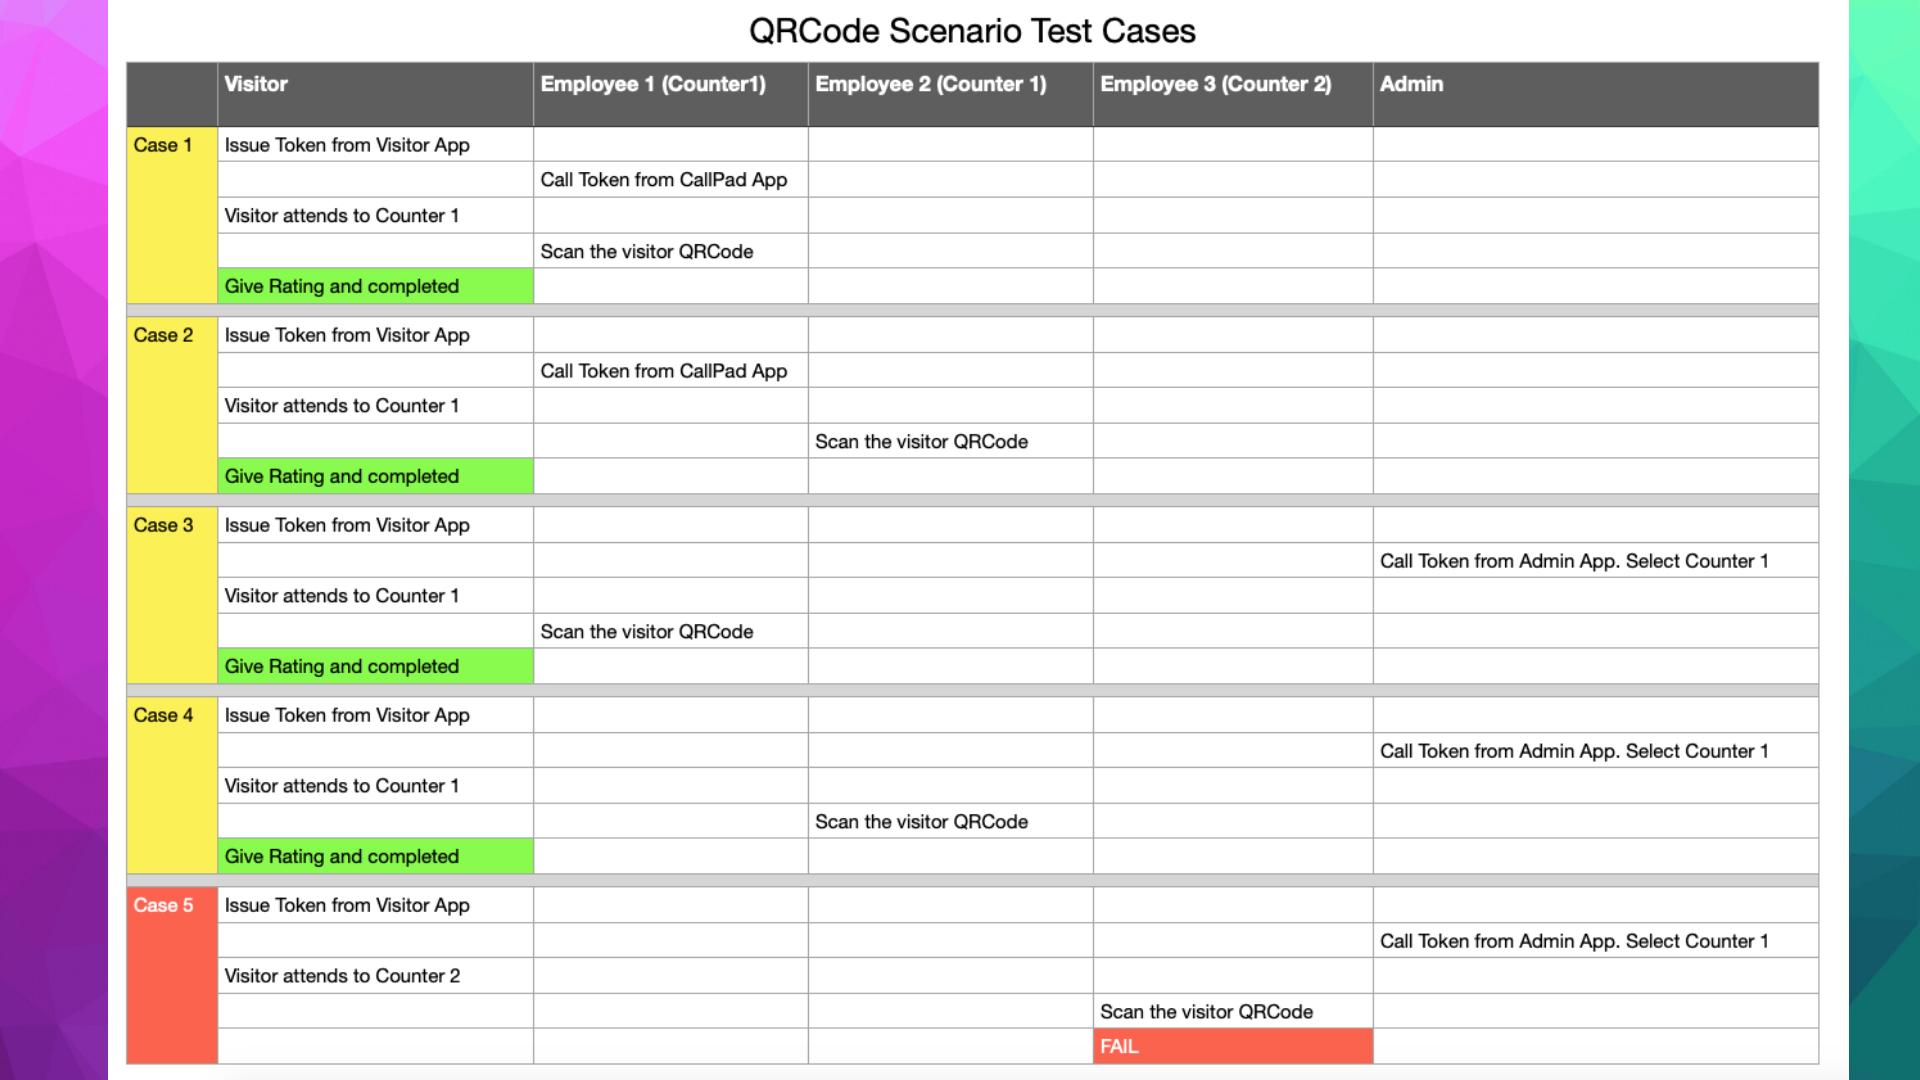 paperlessqms_scan_qrcode_scenario